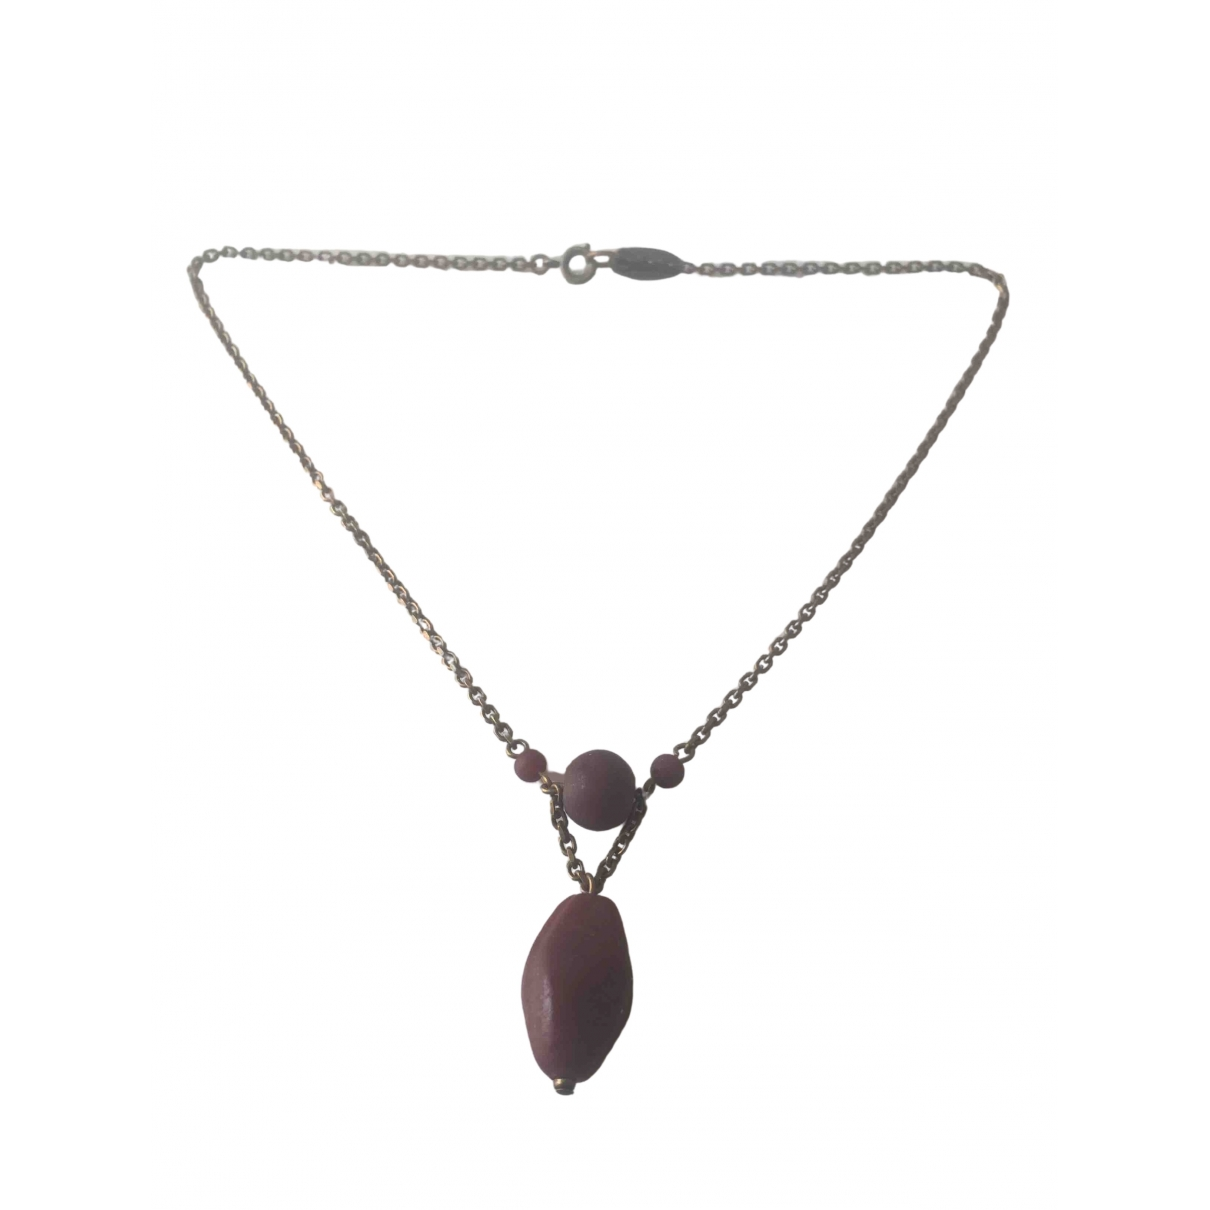 Isabel Marant \N Burgundy Metal necklace for Women \N